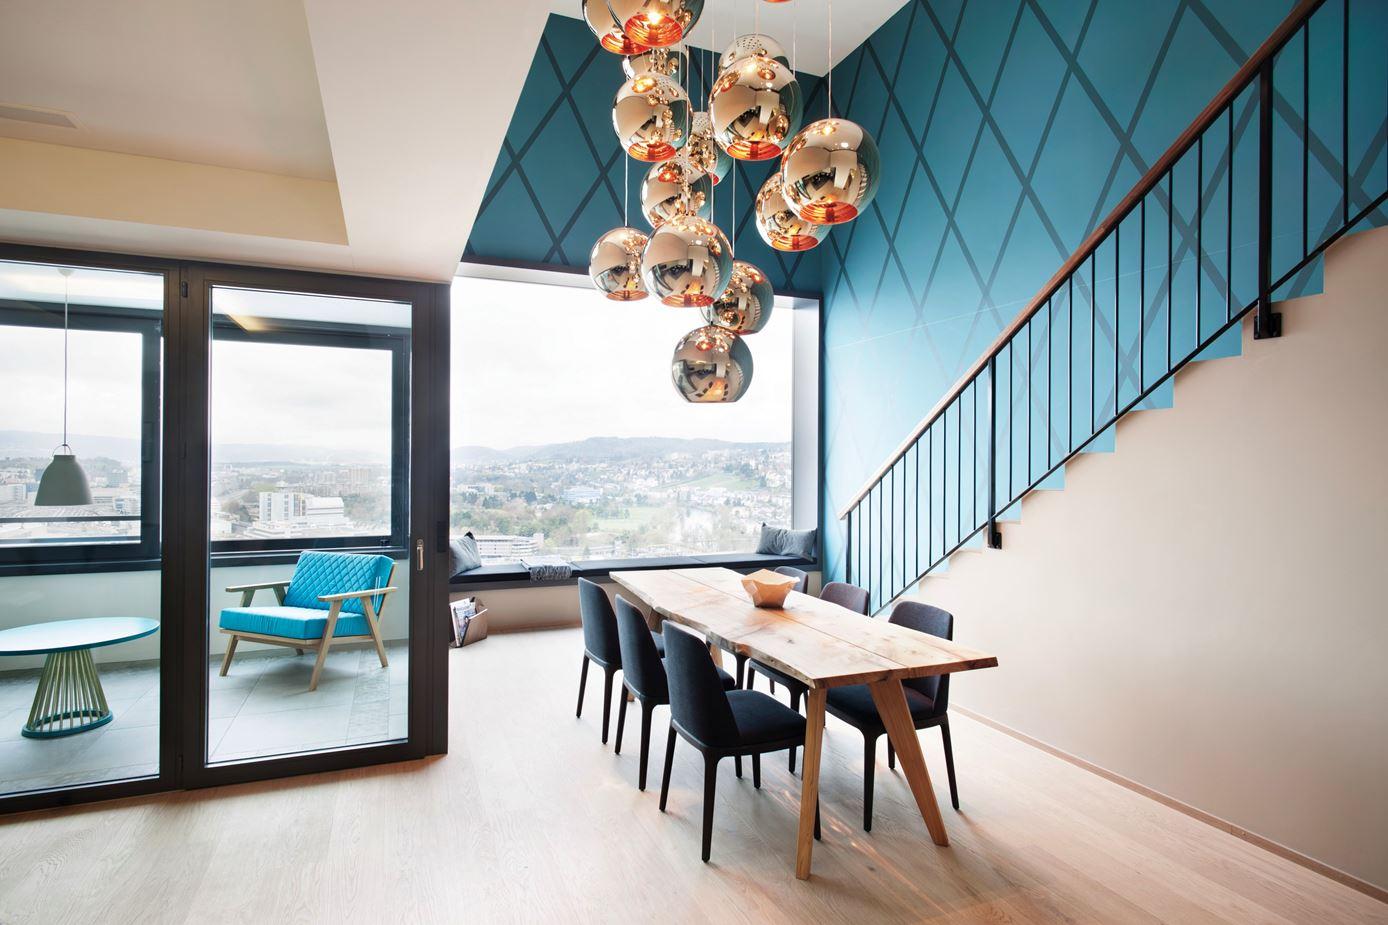 Penthouse Loft Hard Turm Park in Zurich, Switzerland by Dyer-Smith Frey